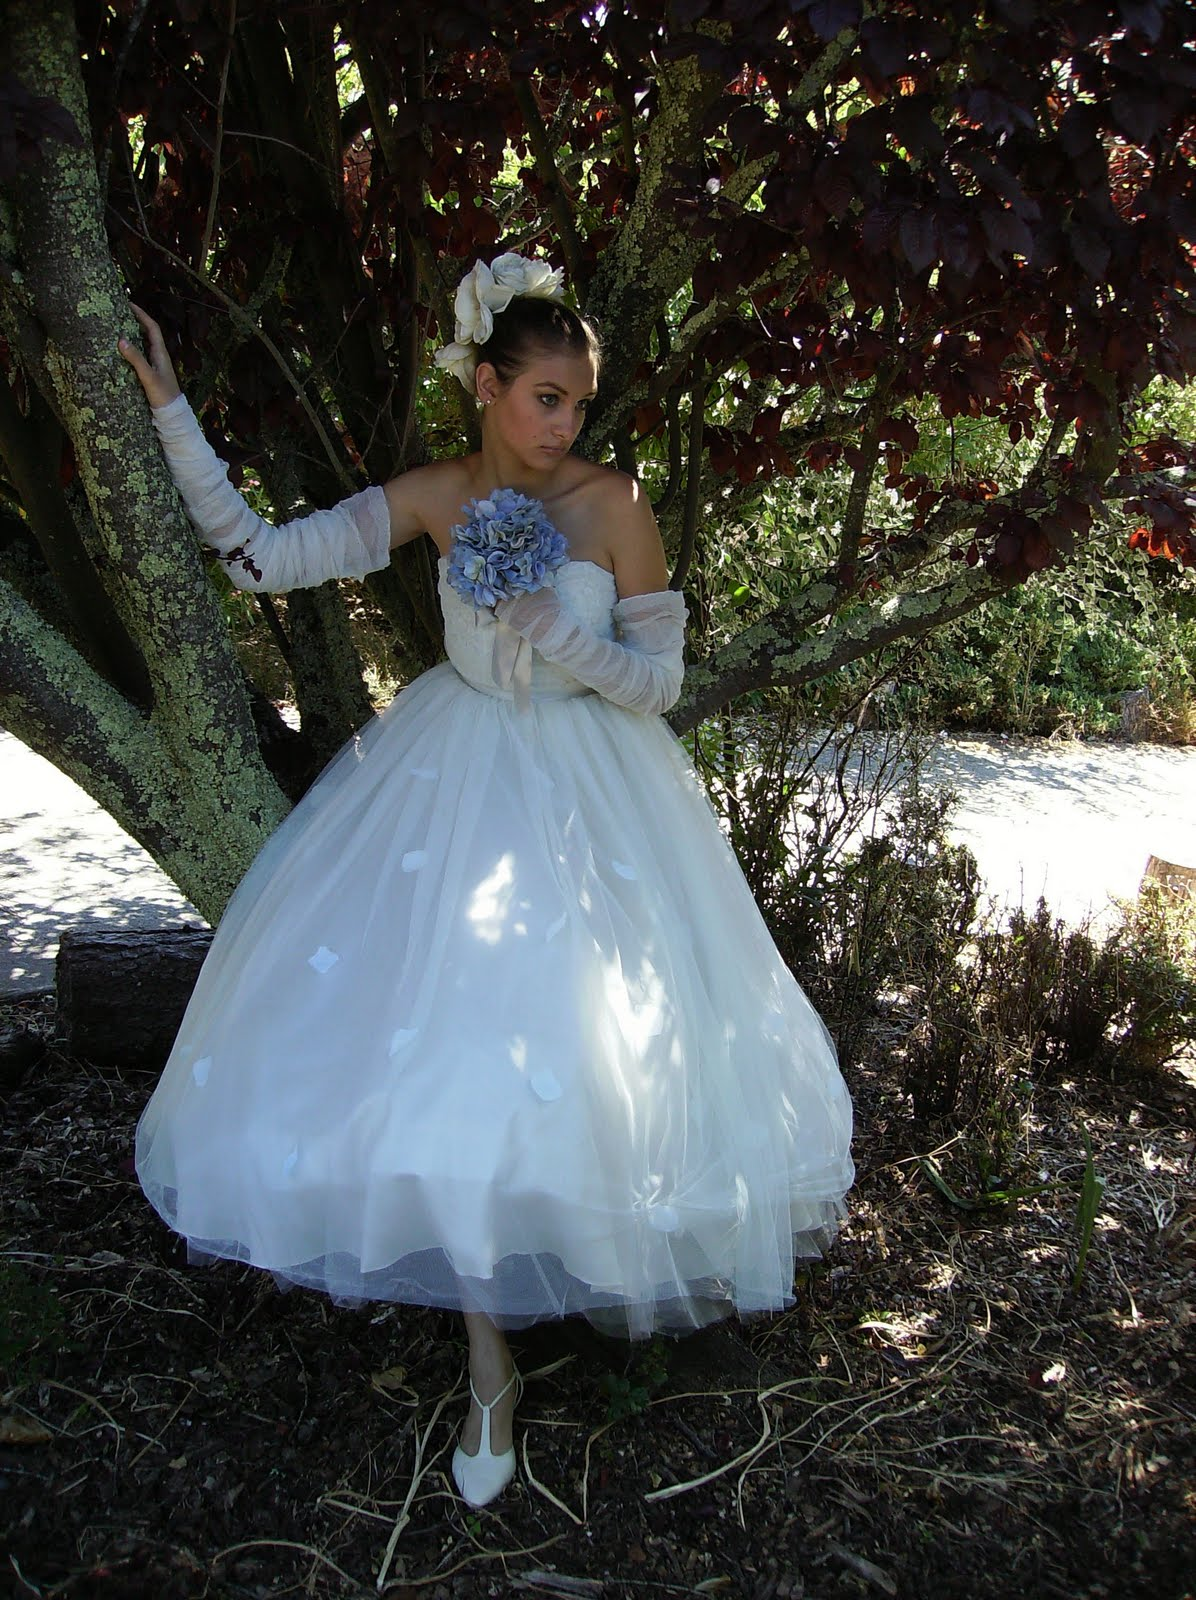 Hristina\'s blog: matric farewell dresses